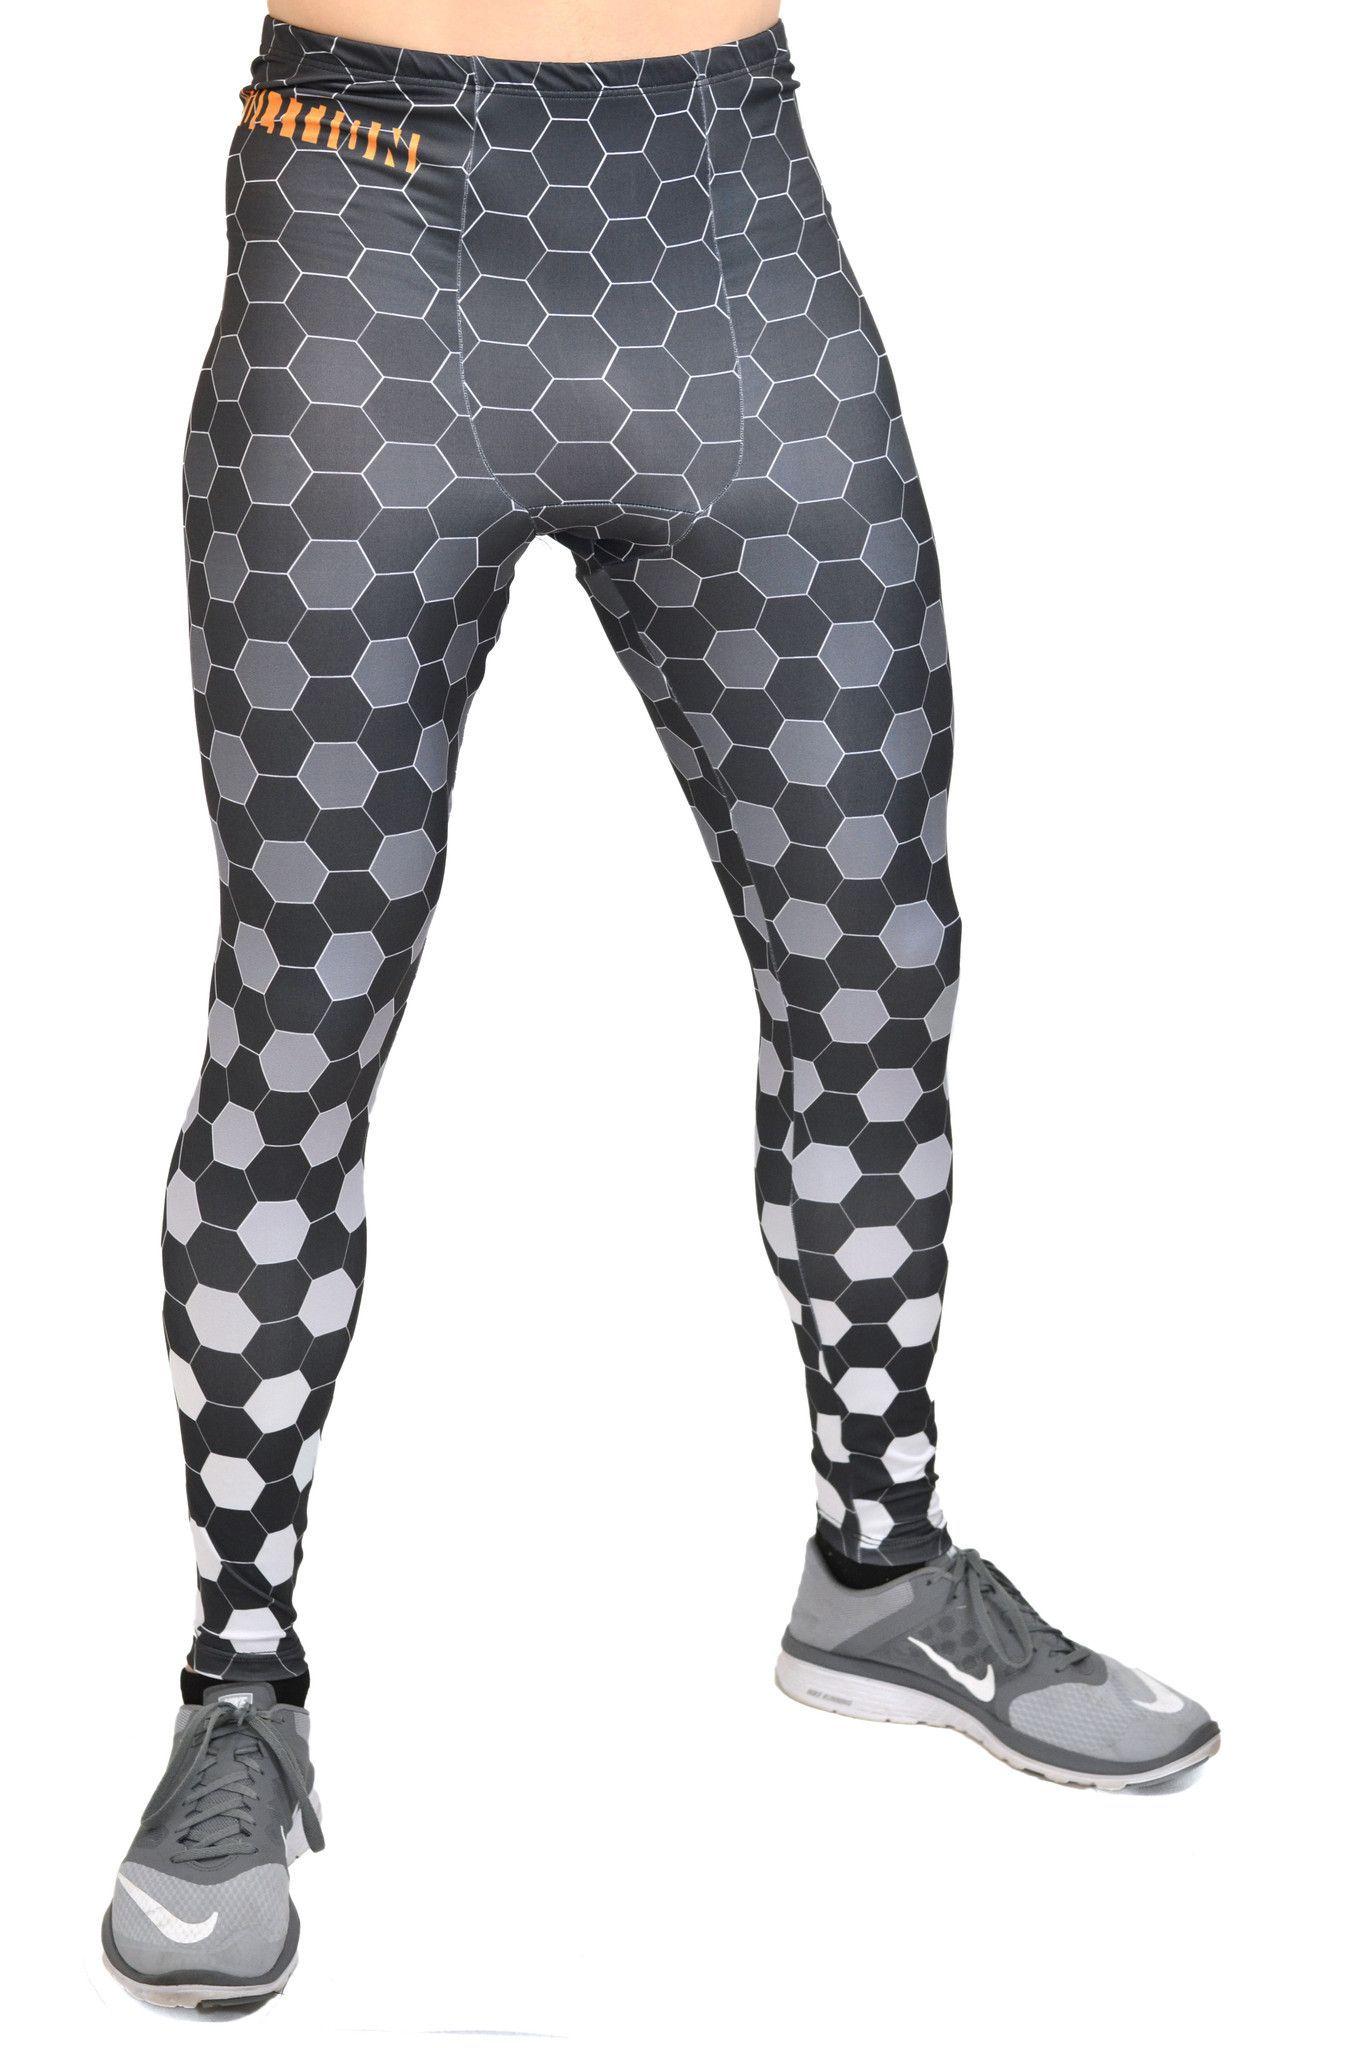 Carbonite meggings meggings polyester spandex fabric